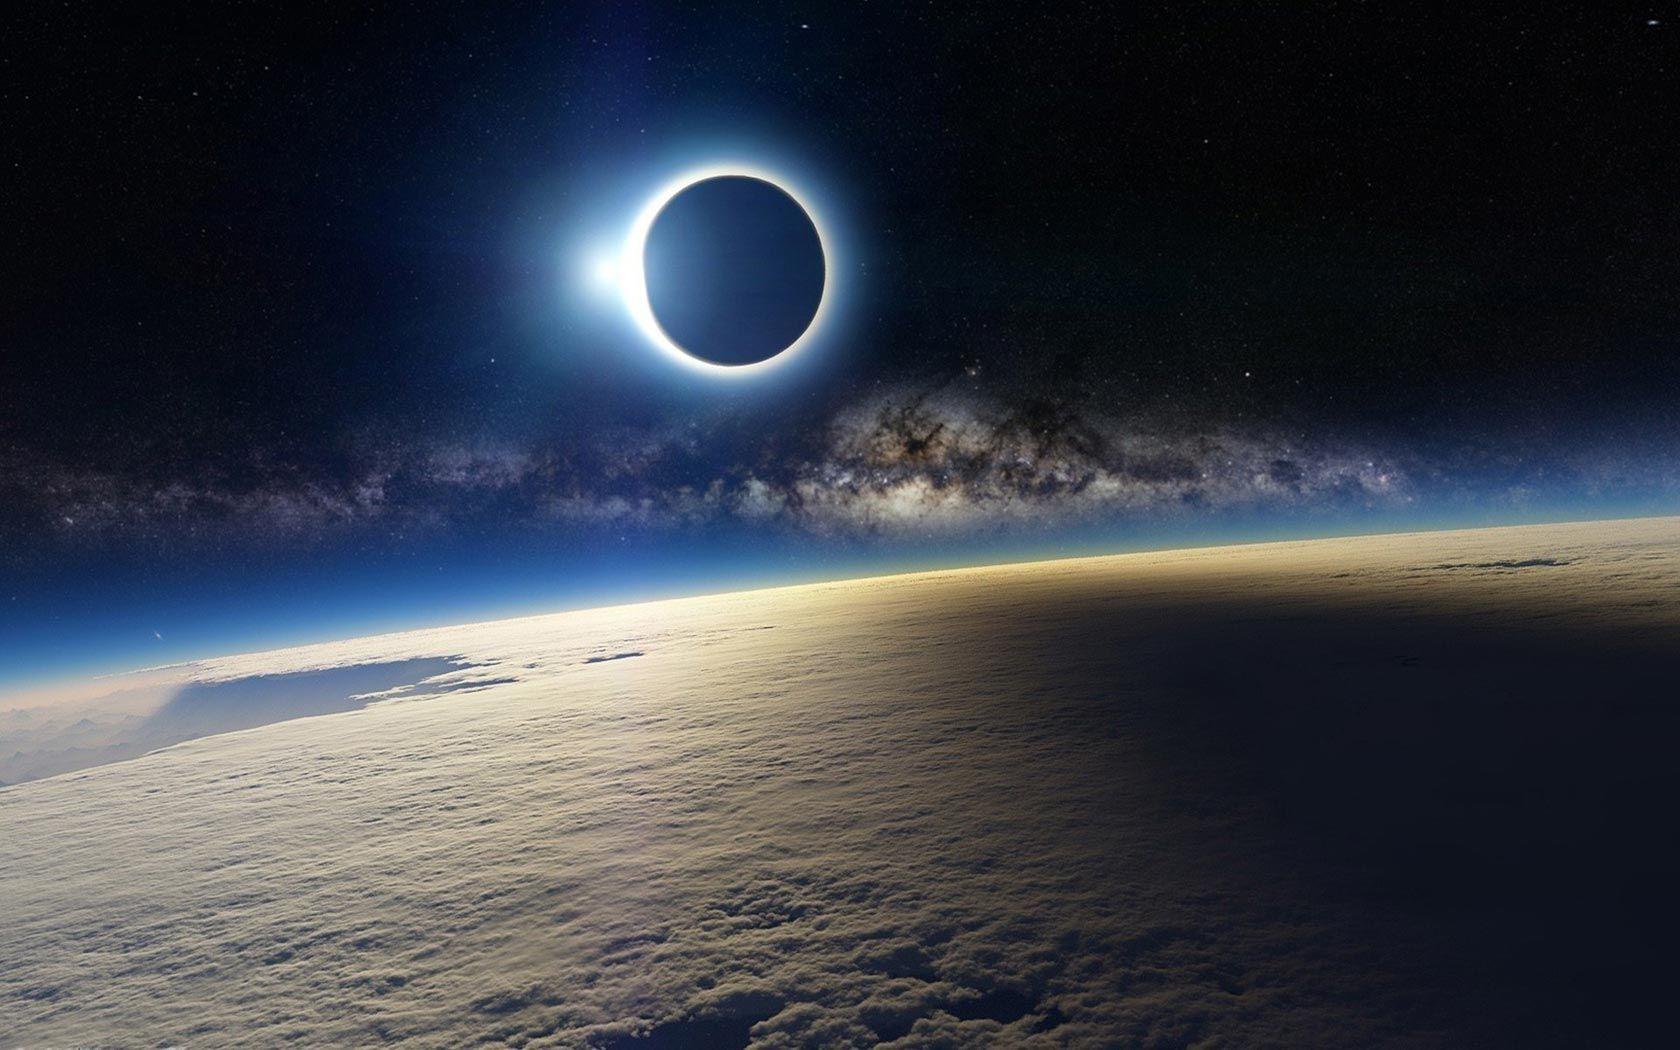 Colouring sheets of the lunar eclipse - Lunar Eclipse Images For Amazing Lunar Eclipse Hr Pictures Hq Wallpaper For Desktop